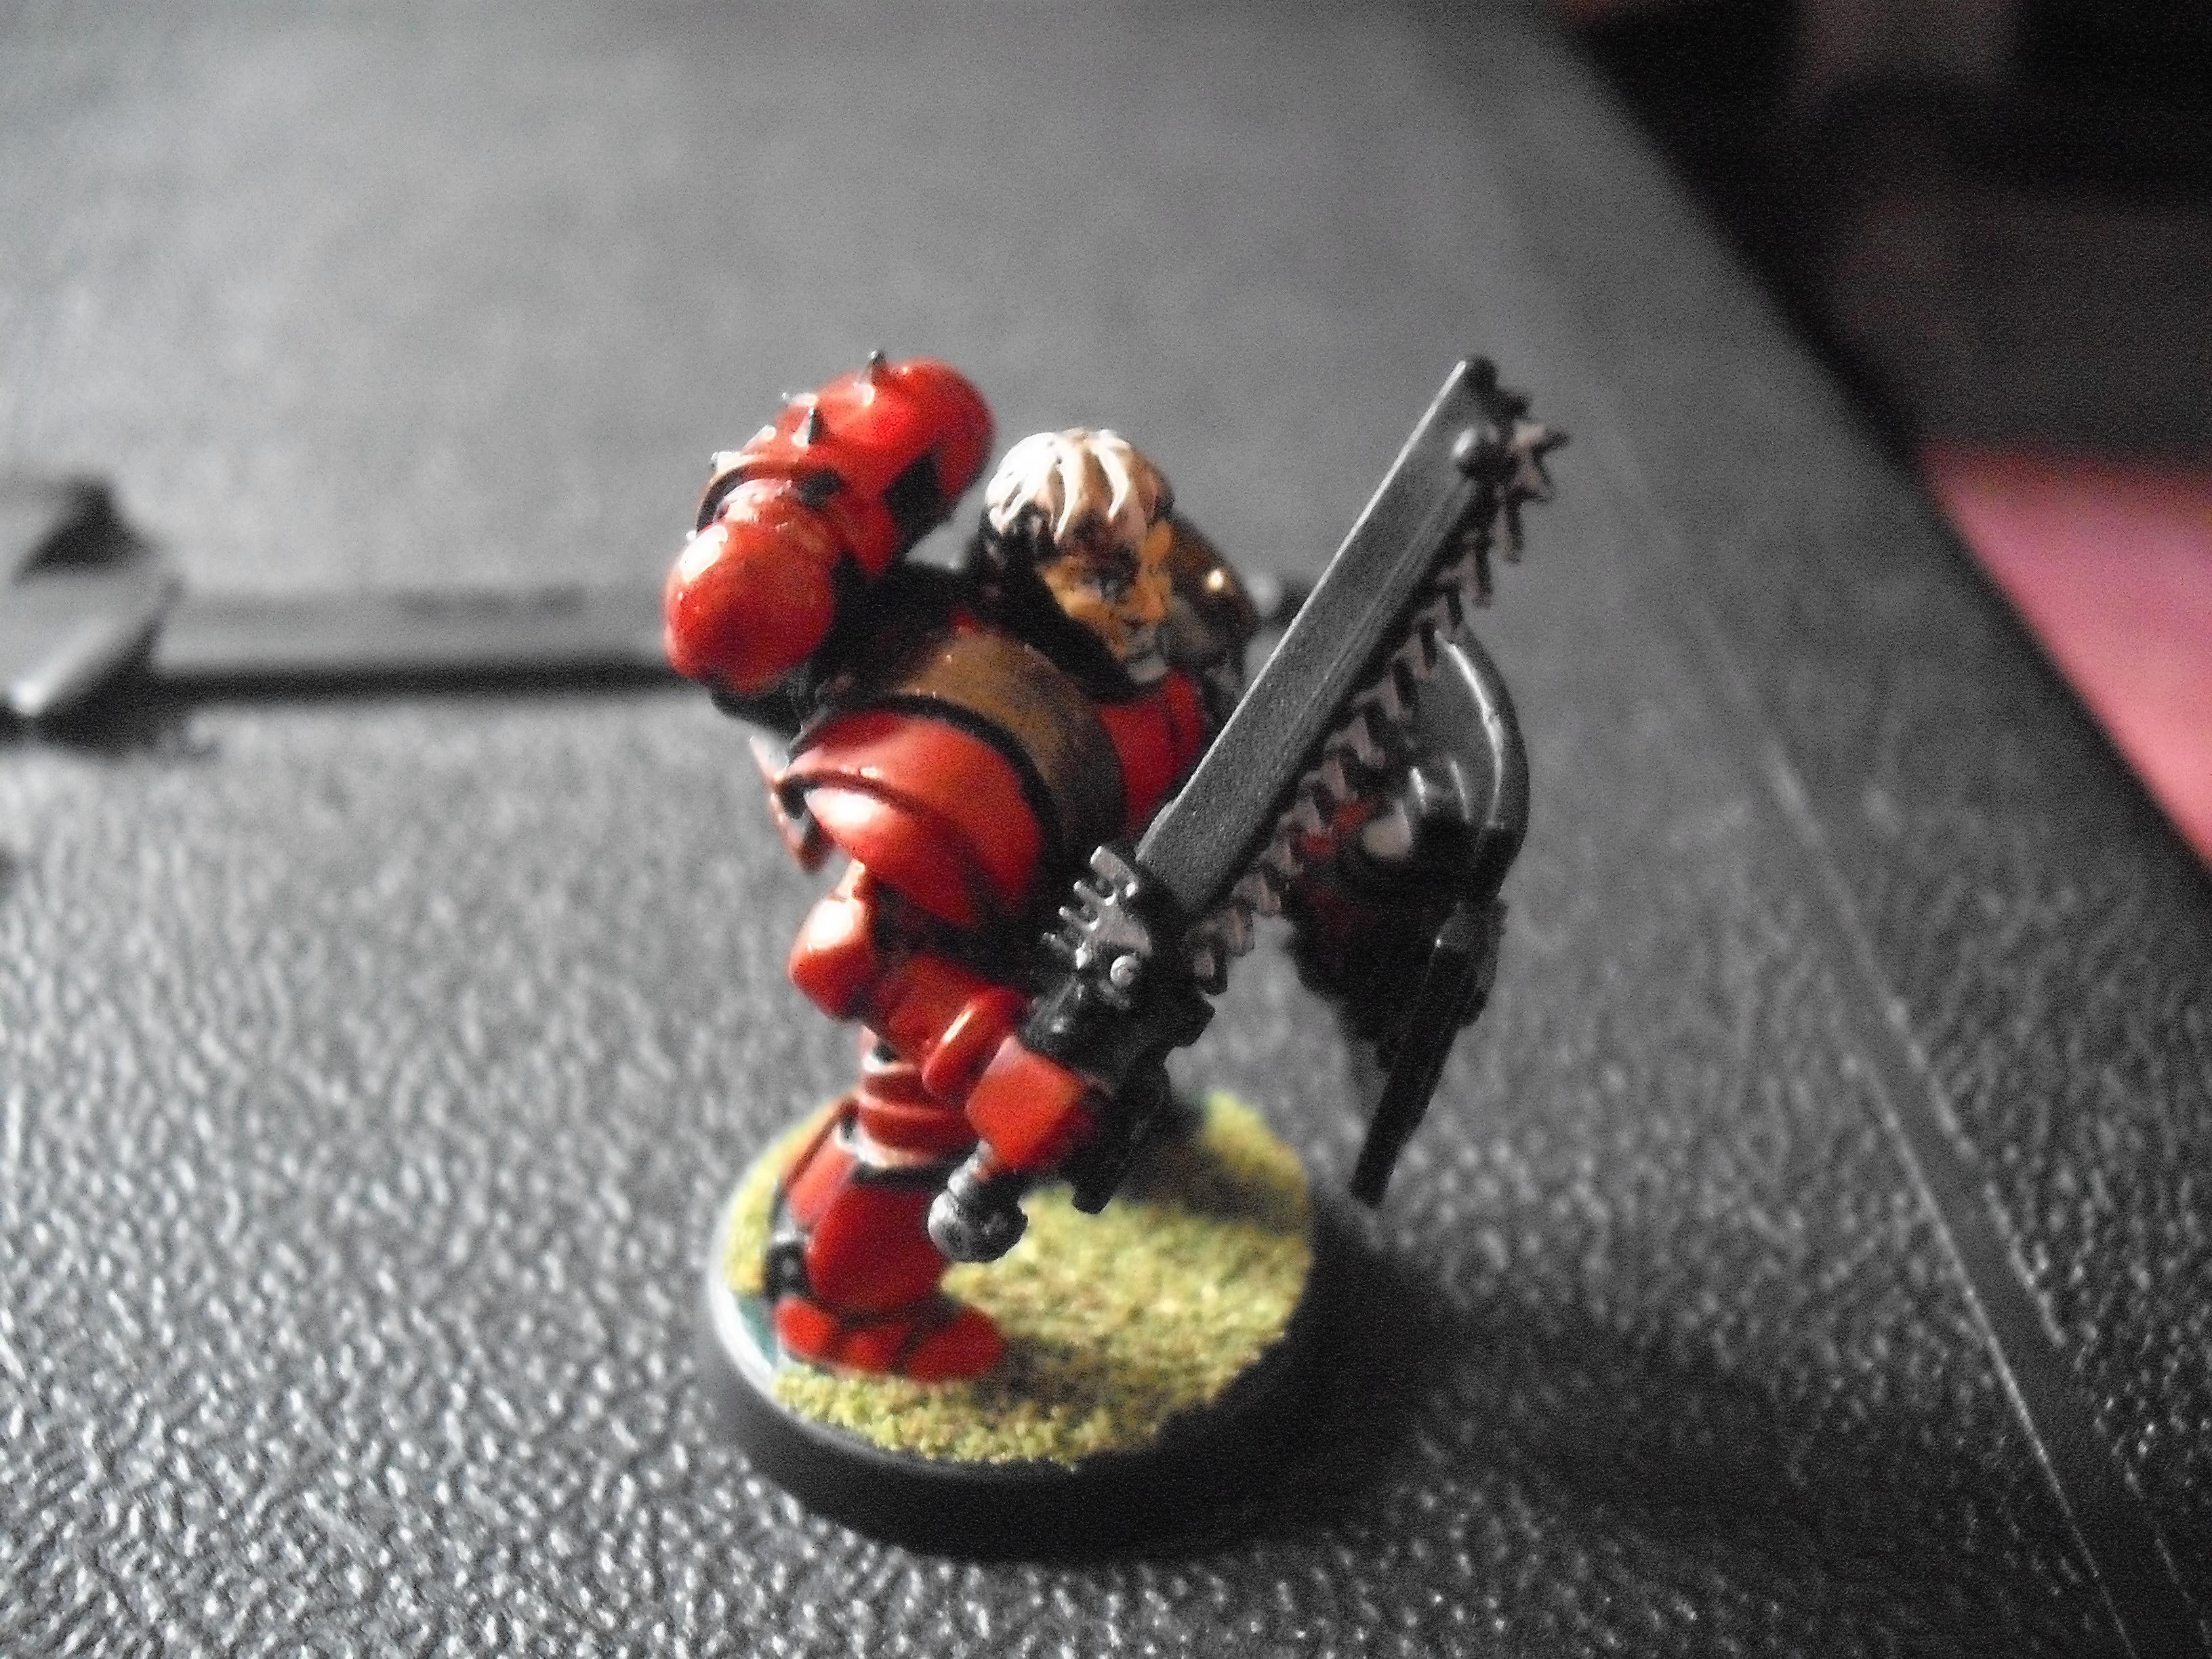 Bare Head, Blood Angels, Chainsword, Honour Guard, Roman Armour, Storm Shield, Veteran